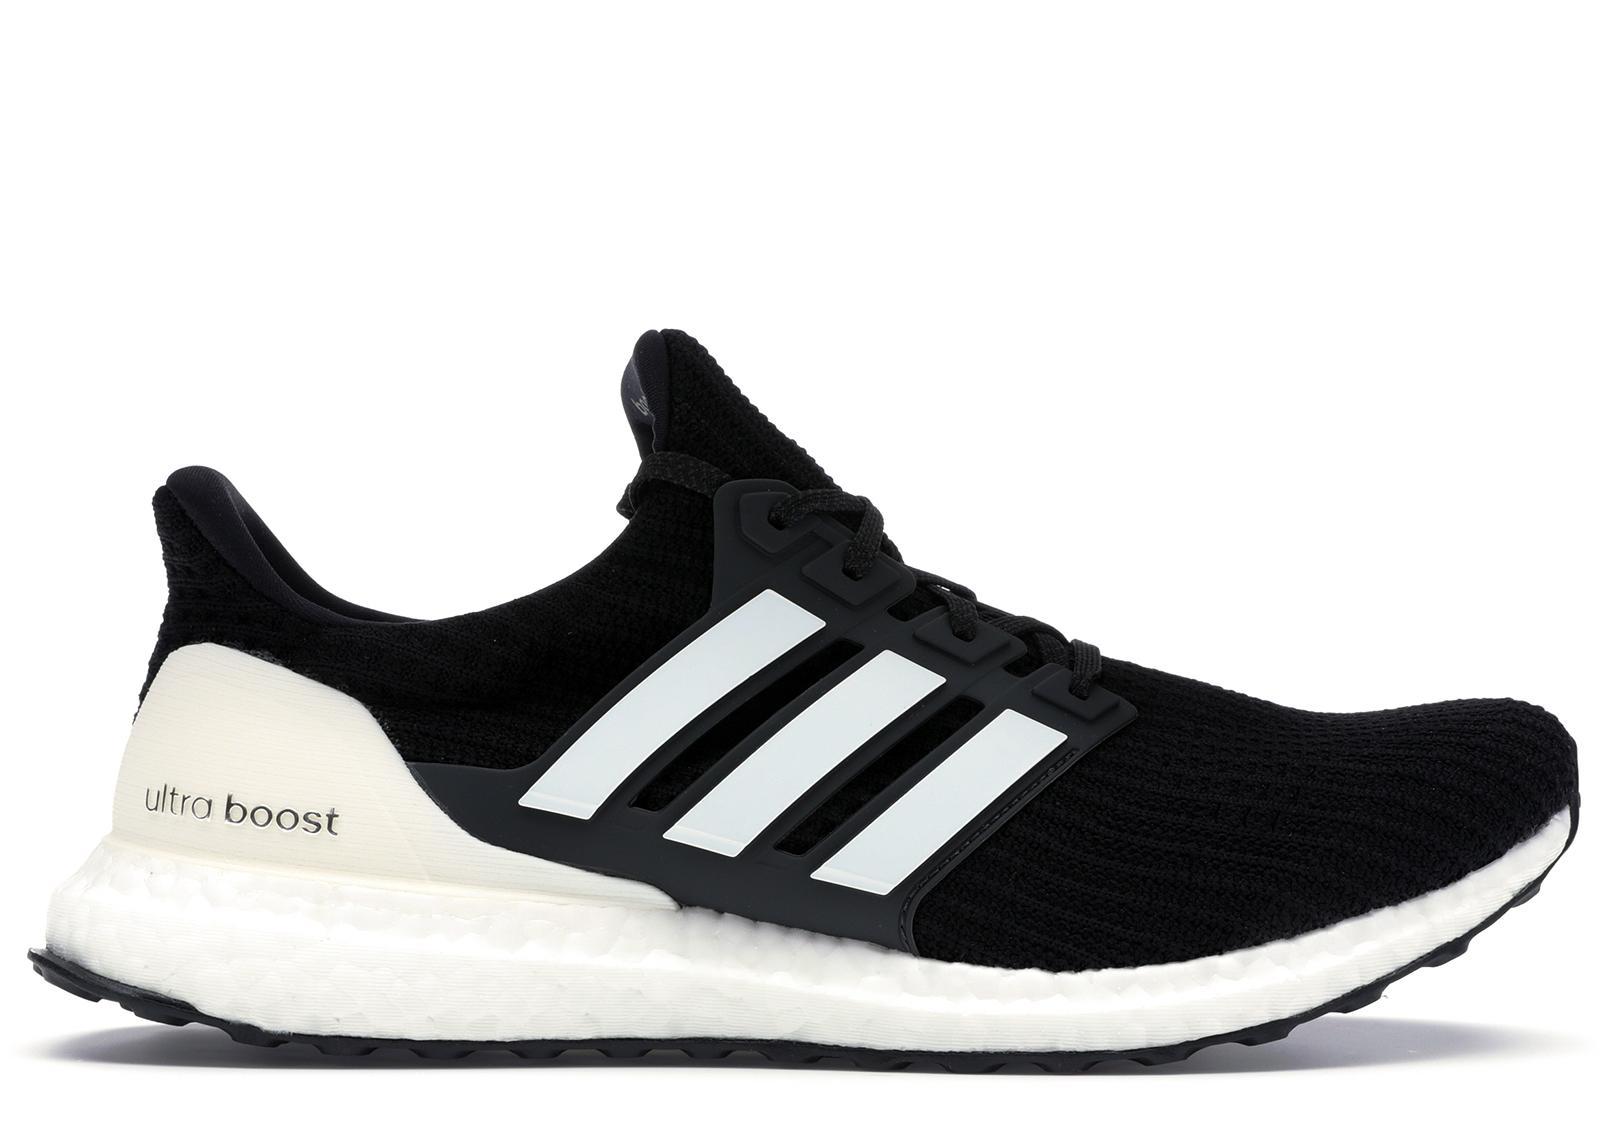 official photos 6d81c 2cac1 HypeAnalyzer · adidas Ultra Boost 4 Show Your Stripes Black